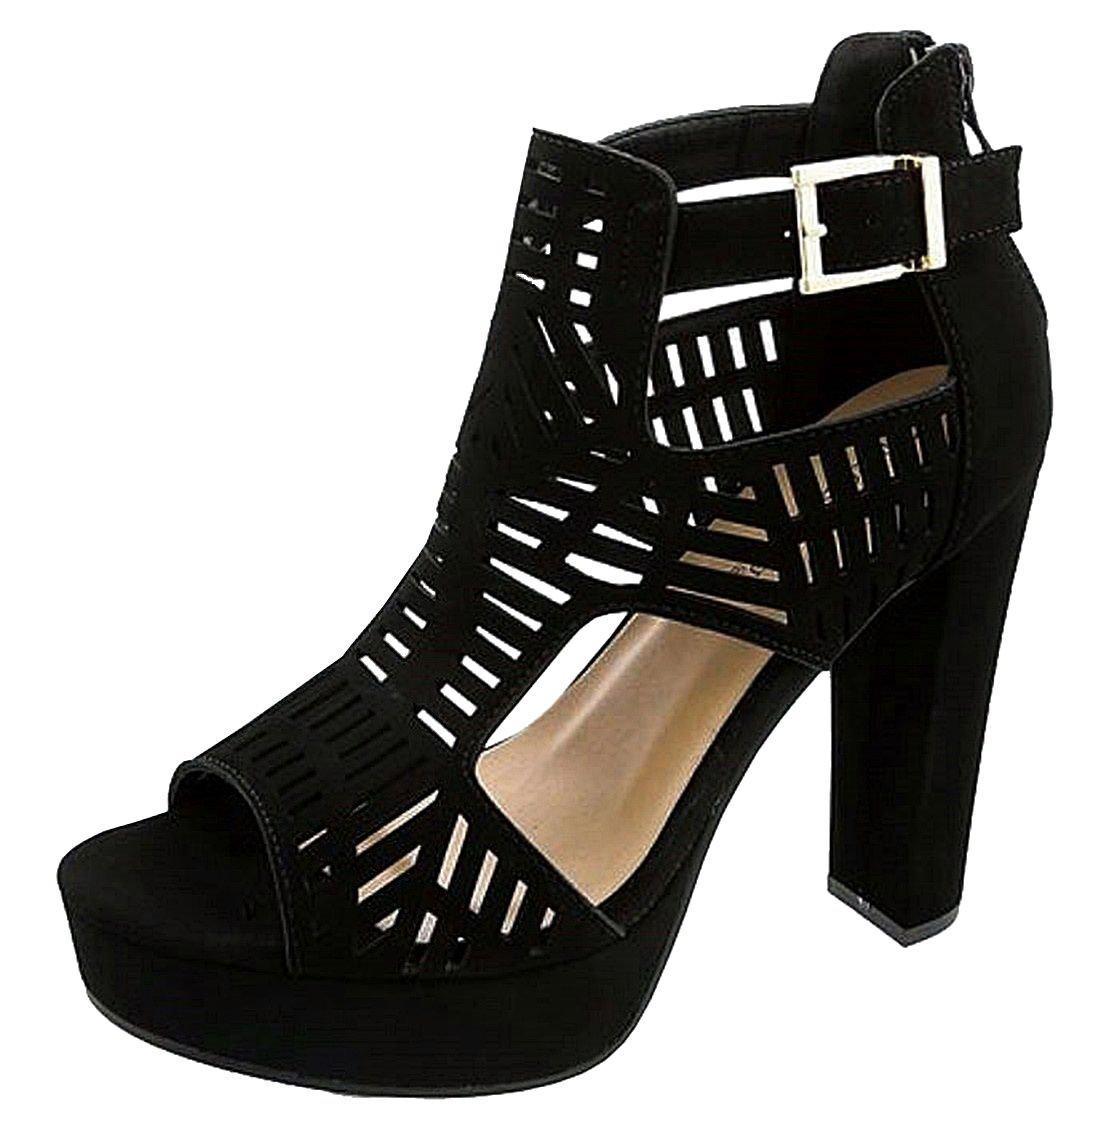 Top Moda Womens High Heel Sandals, Black 8 B(M) US